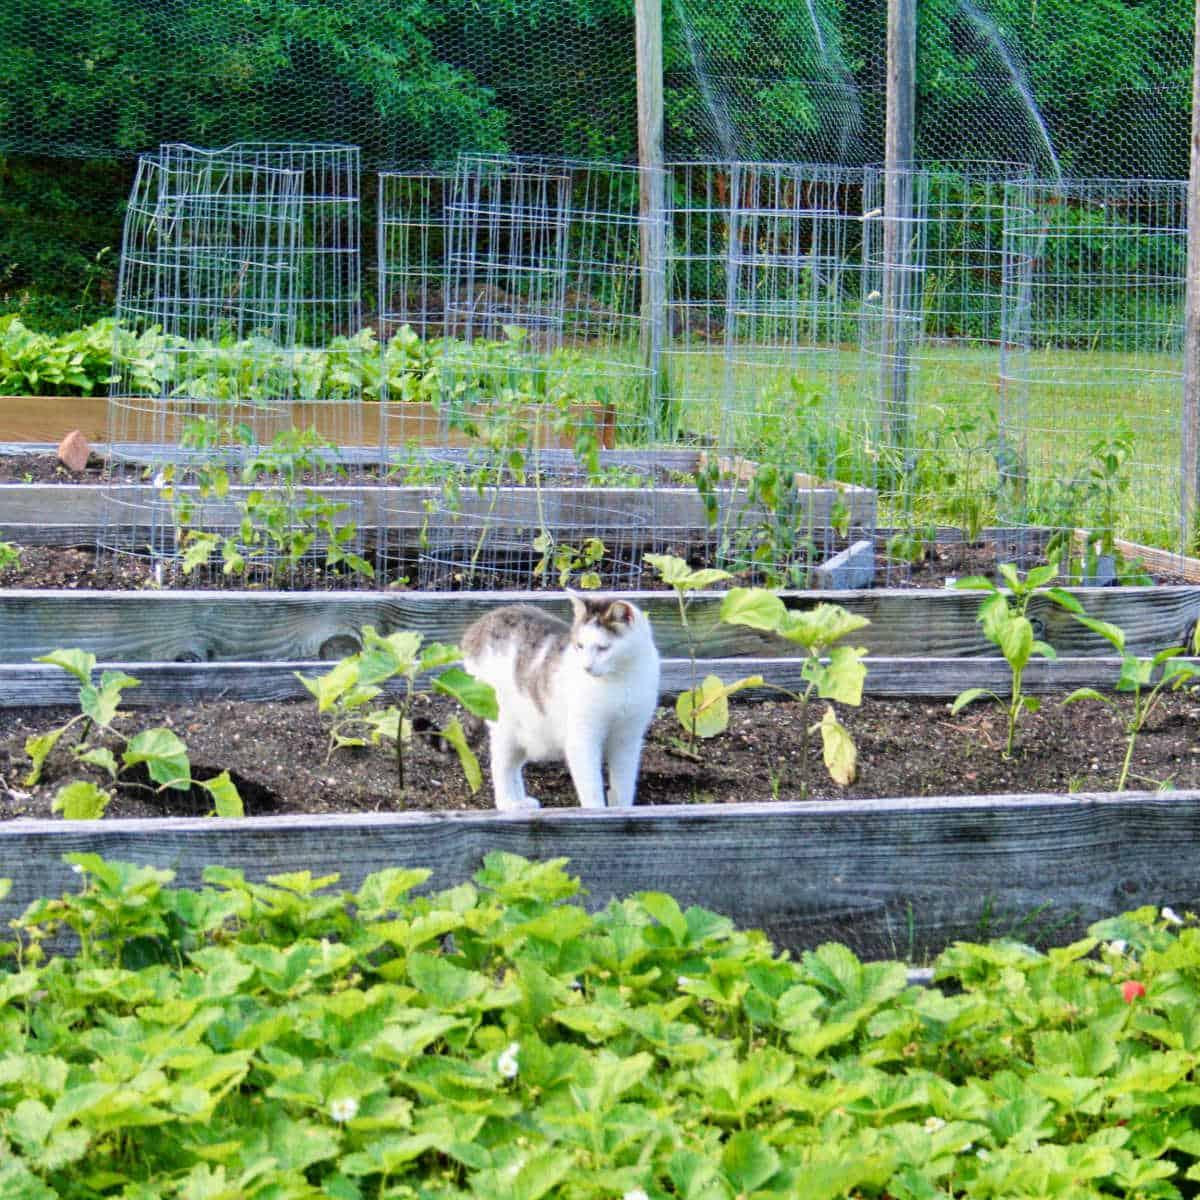 cat in a raised bed garden